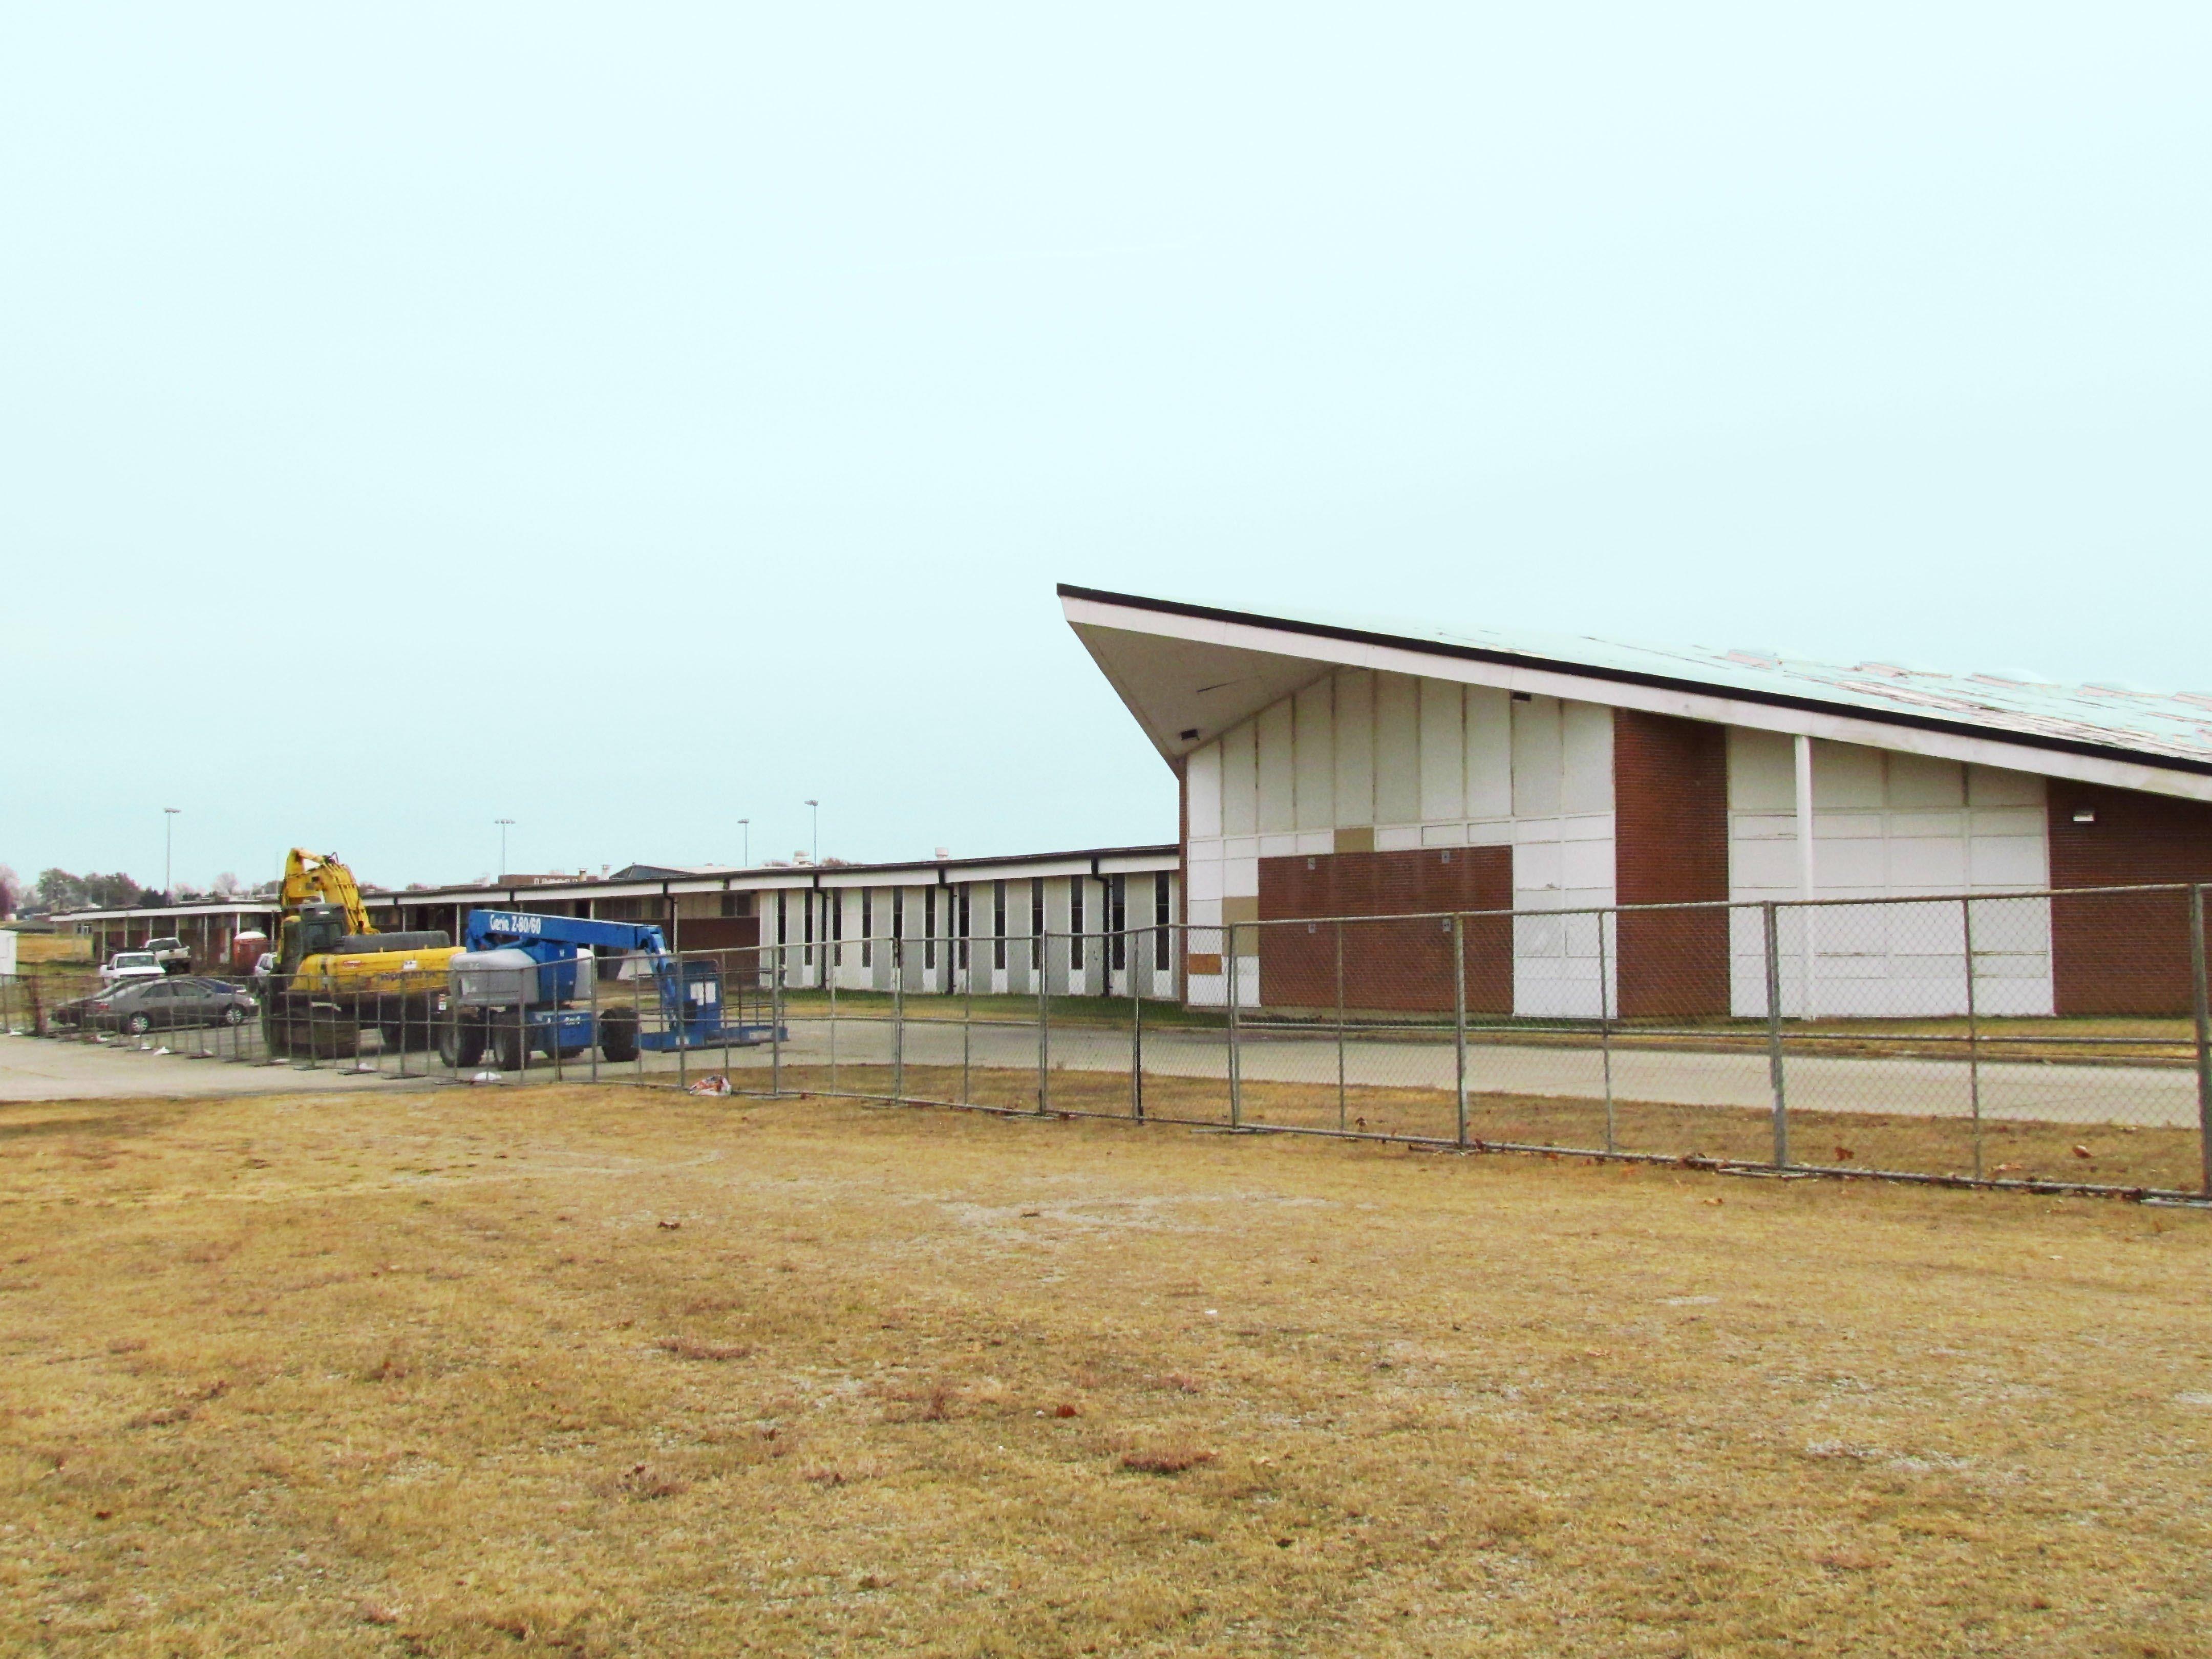 Original Madison is being demolished